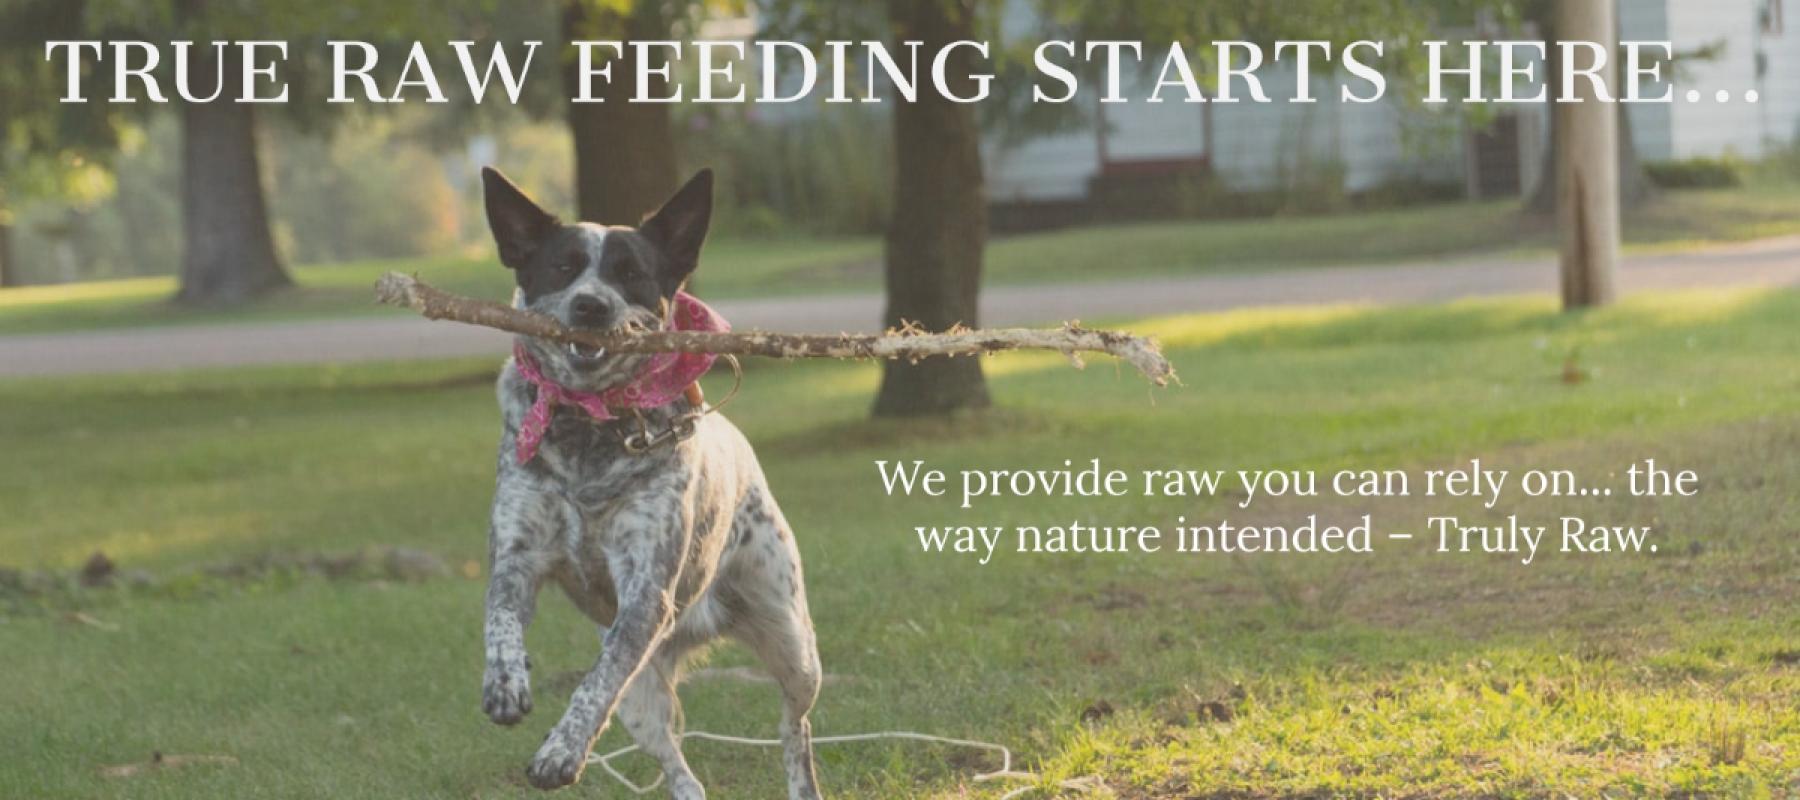 true-raw-feeding-starts-here